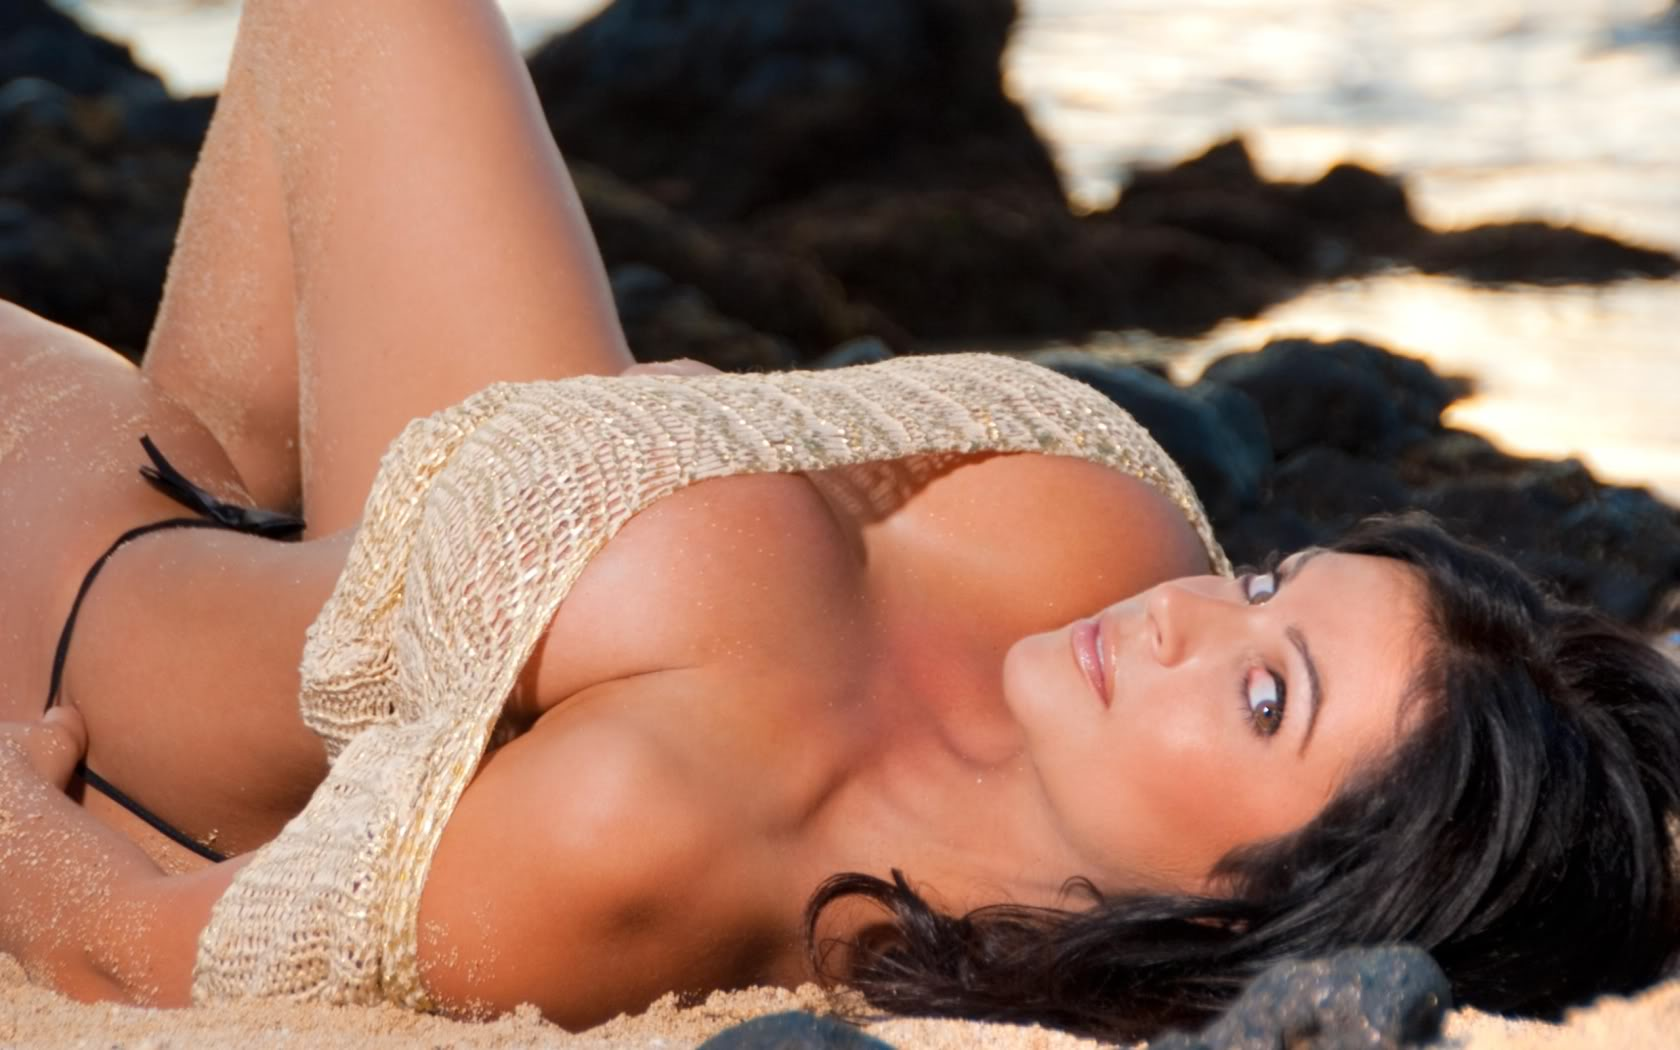 Фото порно денис милани, Denise Milani - все порно и секс фото модели 1 фотография